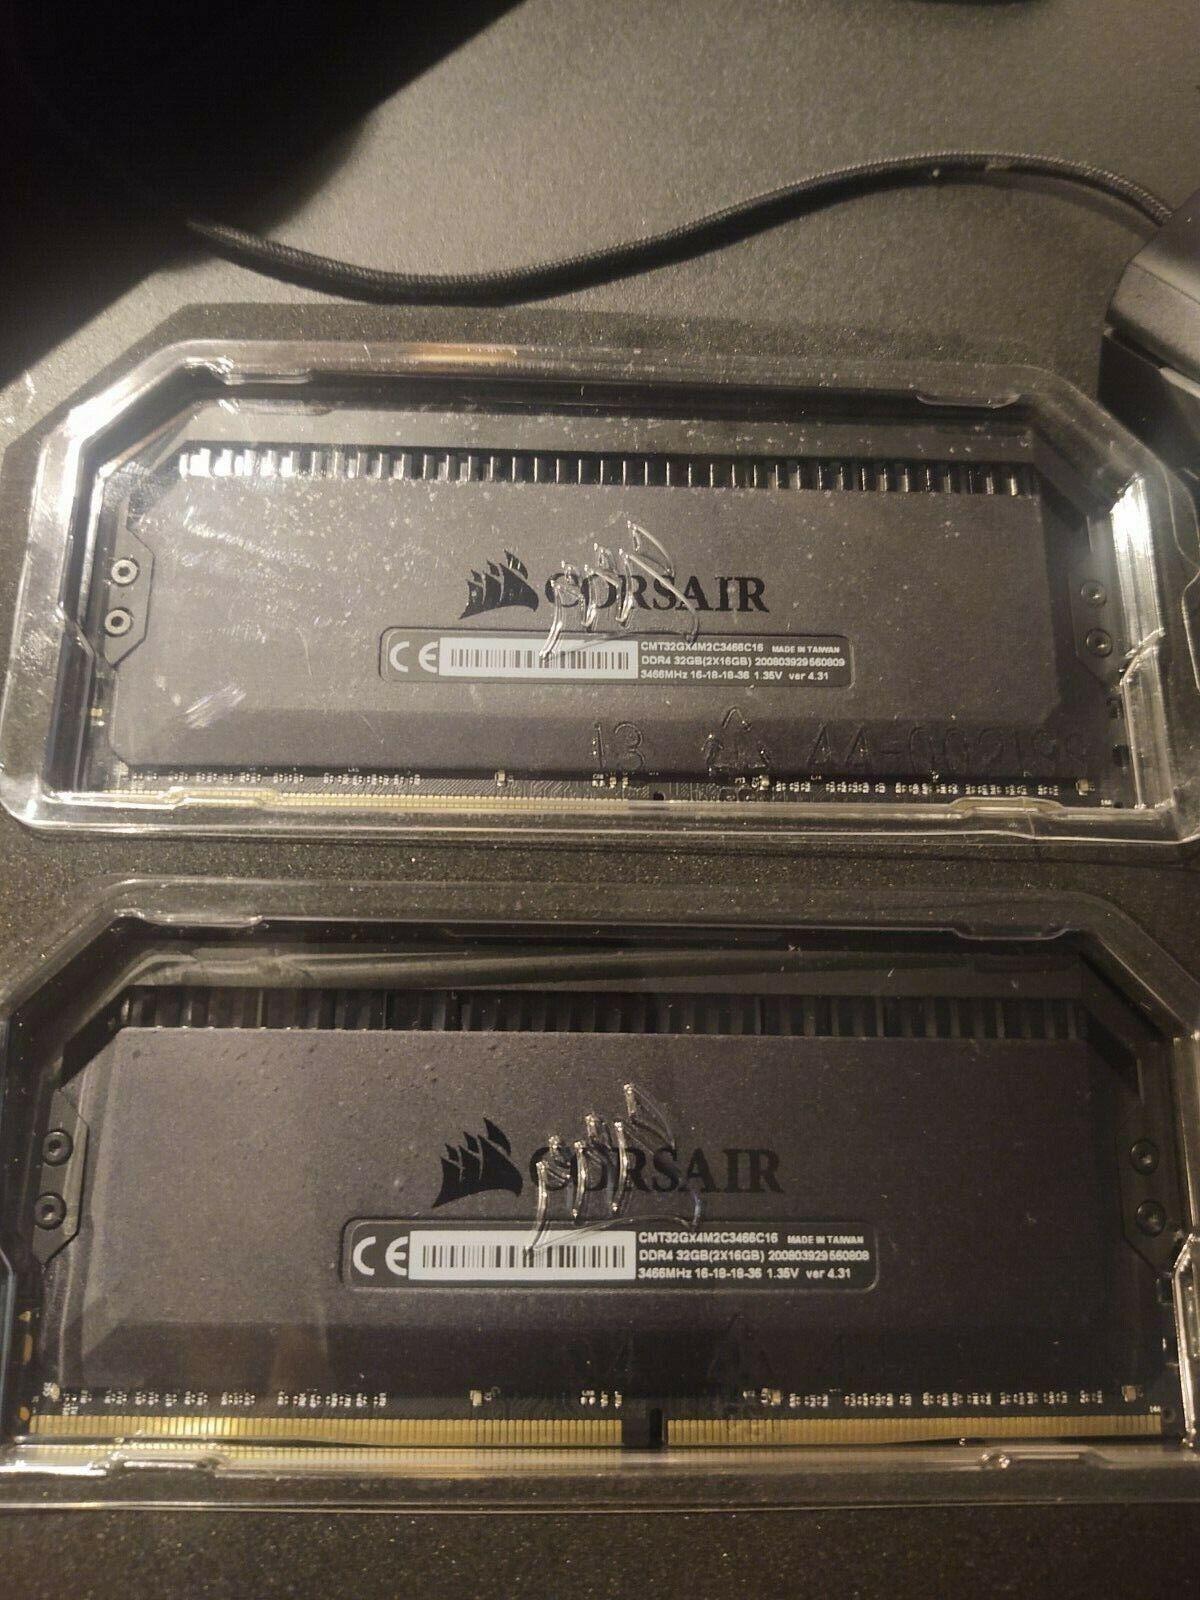 Corsair CMD32GX4M2C3200C16 Dominator Platinum 32GB (2x16GB) DDR4 RAM Memory Kit. Buy it now for 140.00